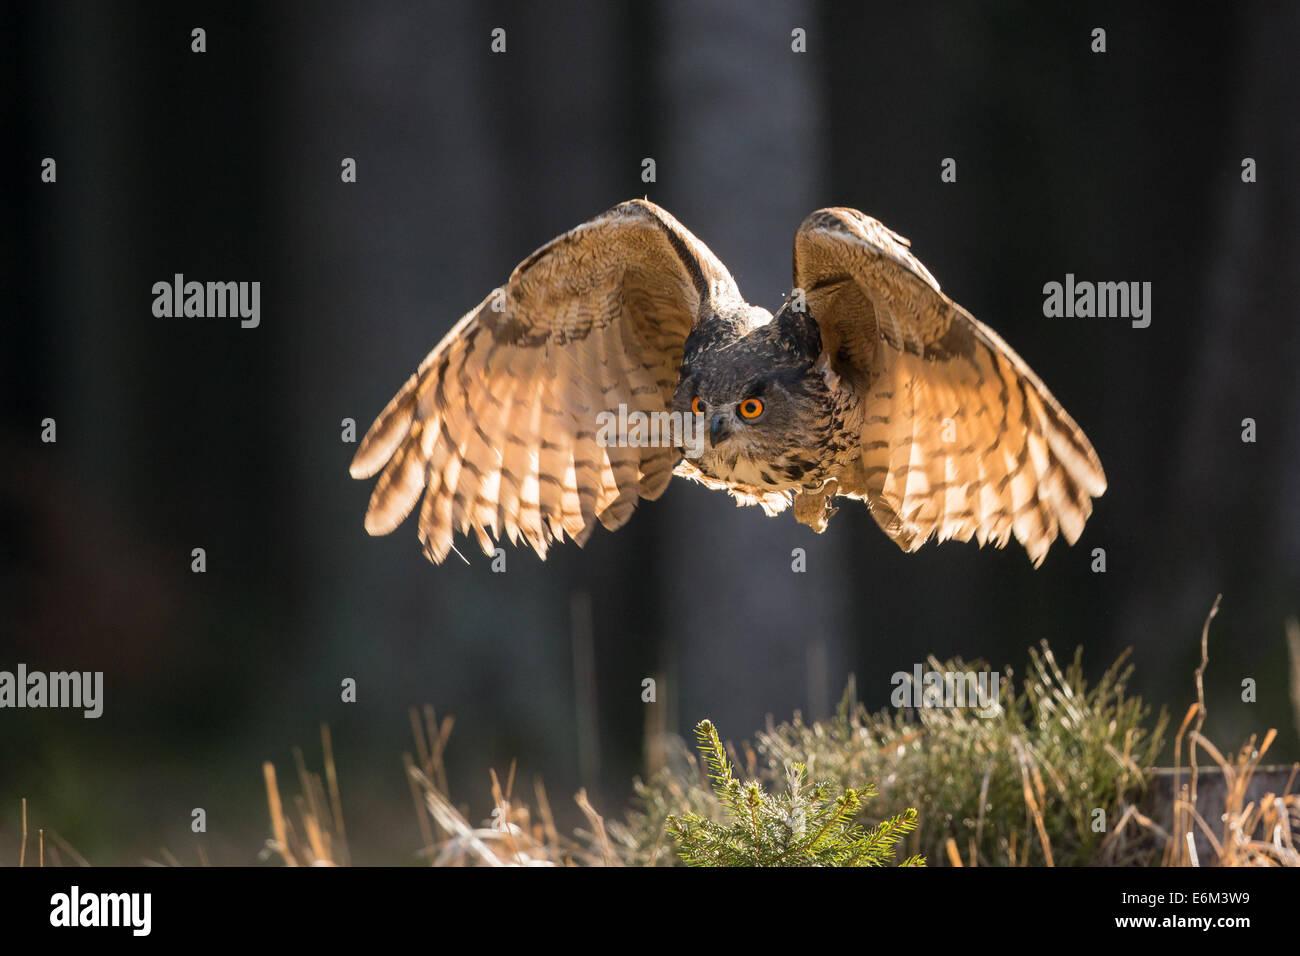 Eurasische Uhu (Bubo Bubo) im Flug, Hintergrundbeleuchtung Stockbild